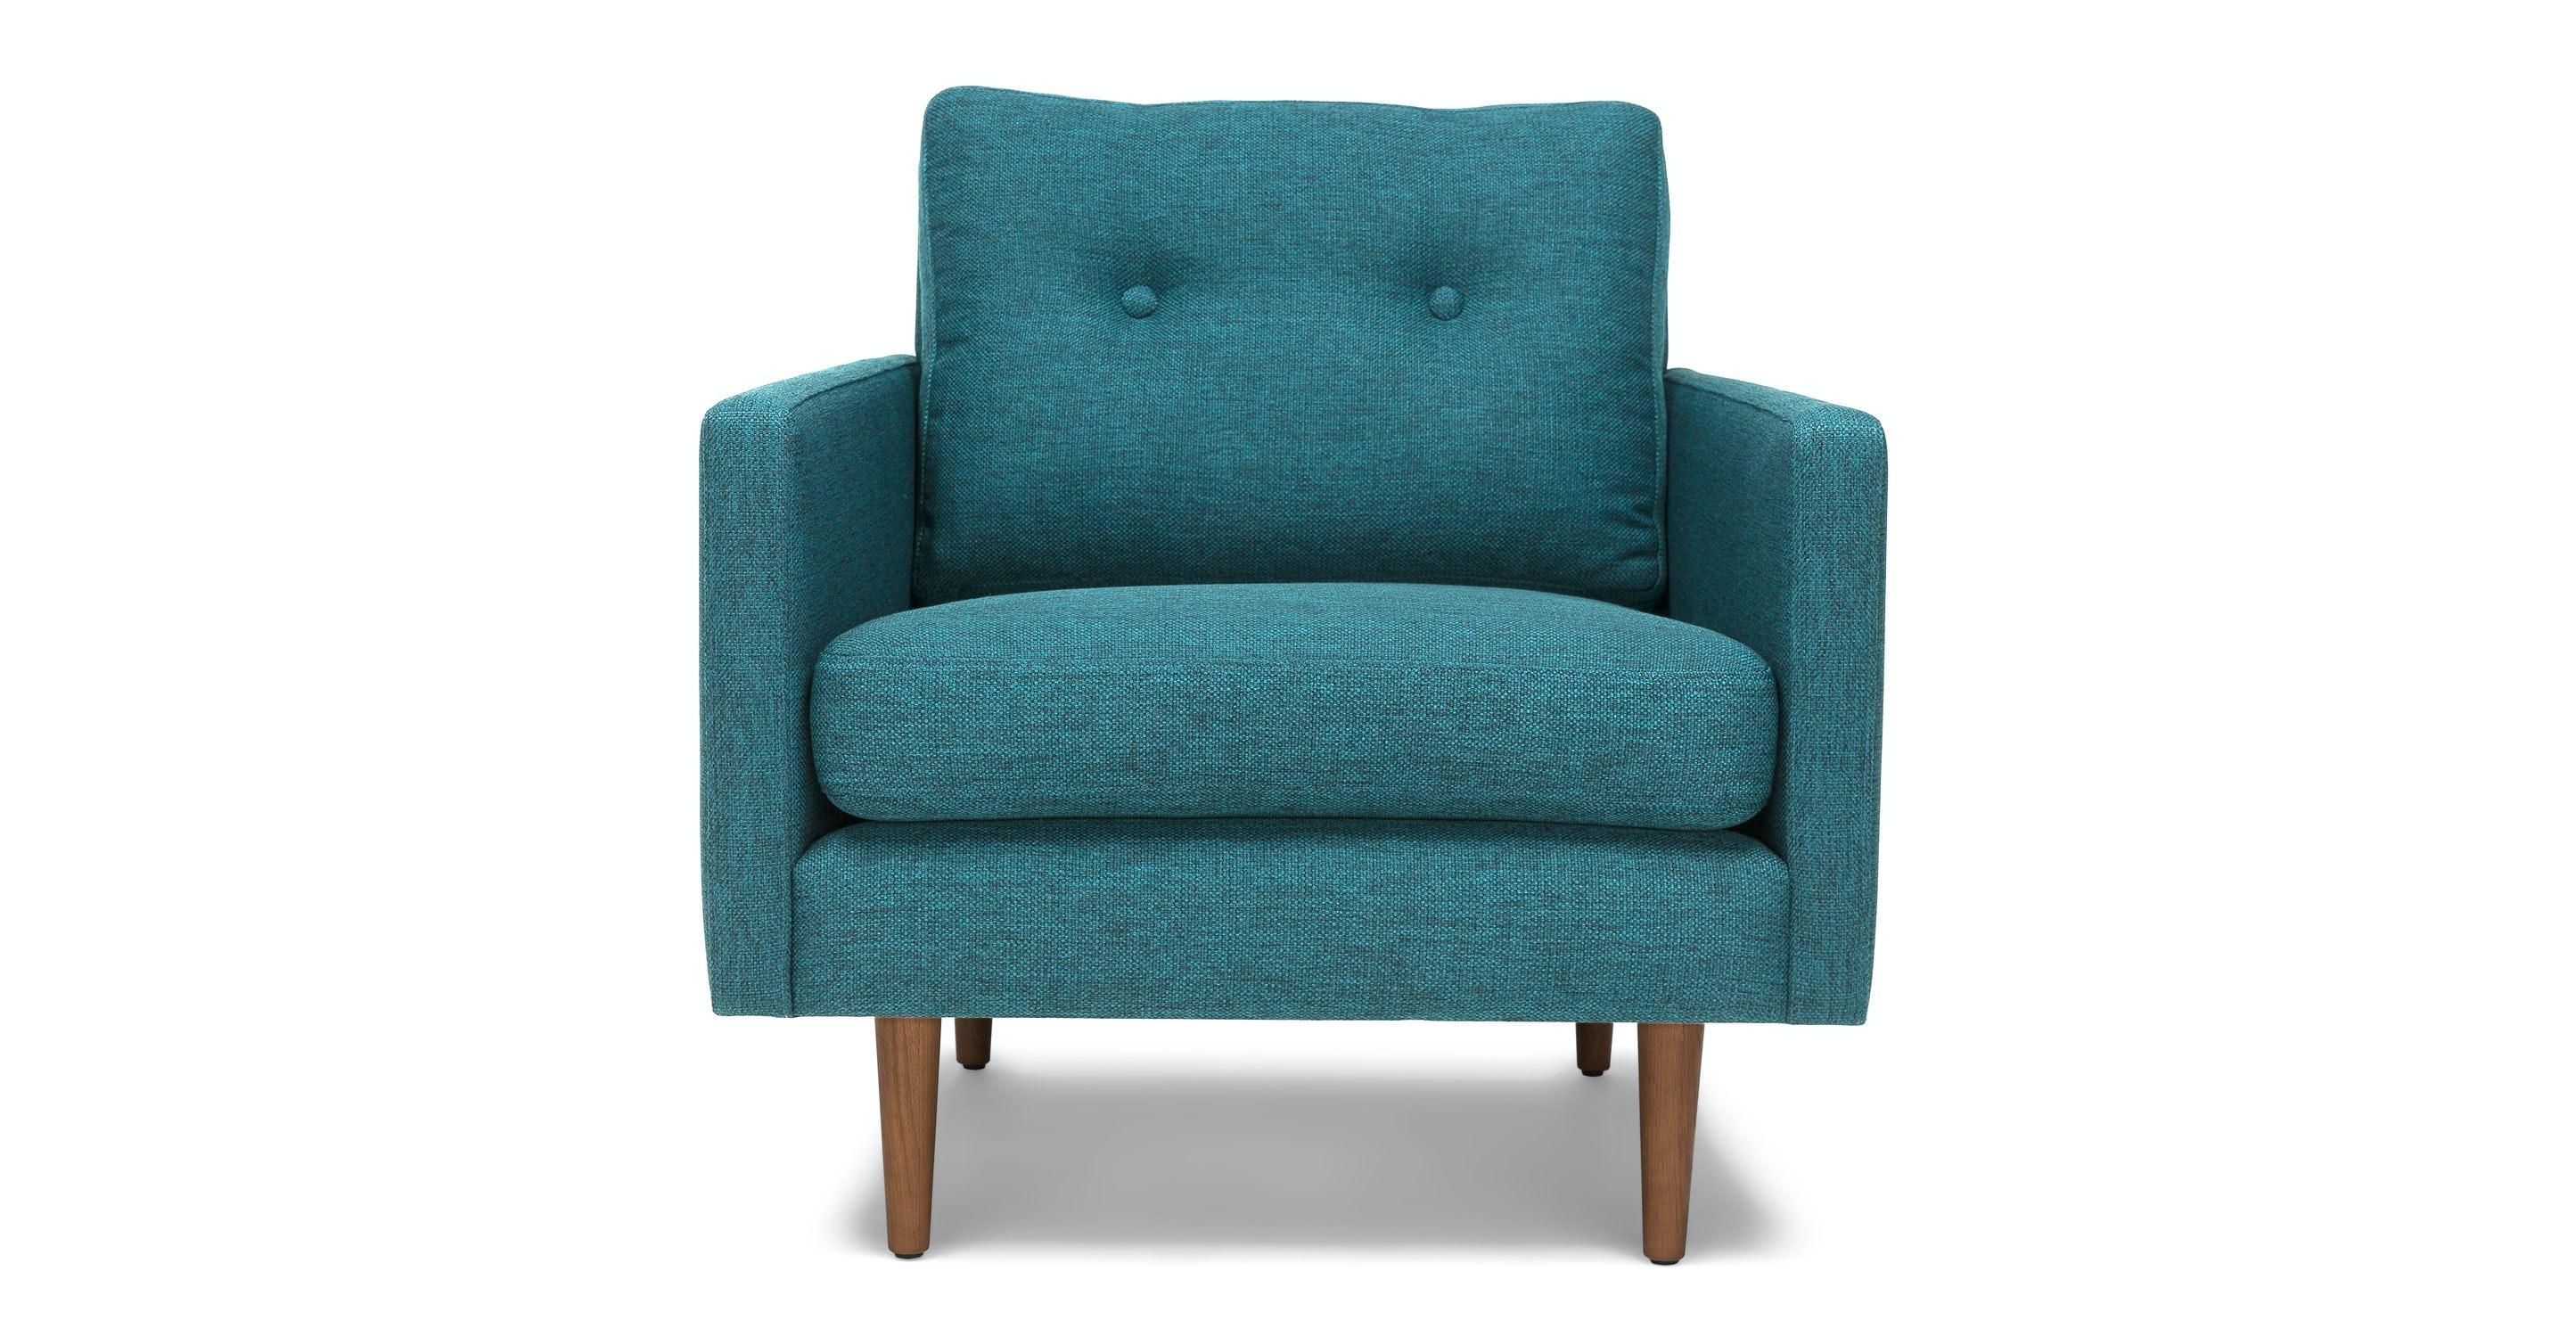 Noah Arizona Turquoise Armchair Lounge Chairs Article